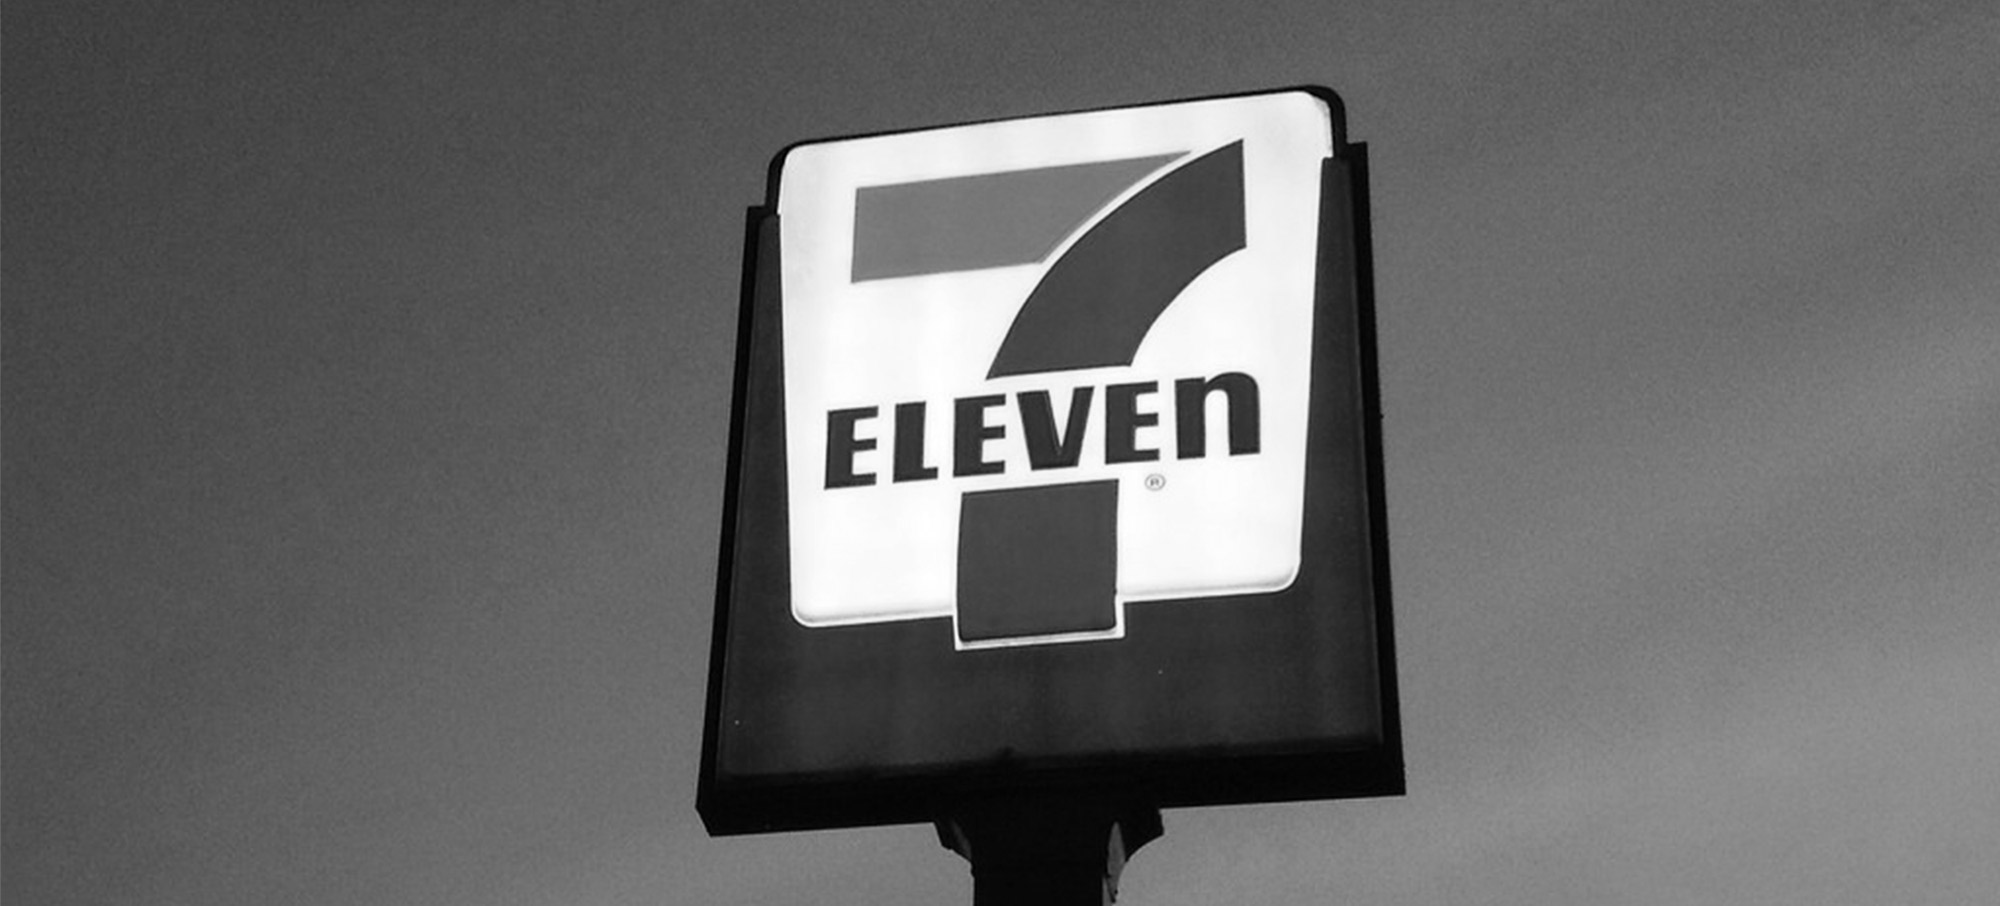 7-eleven_bw